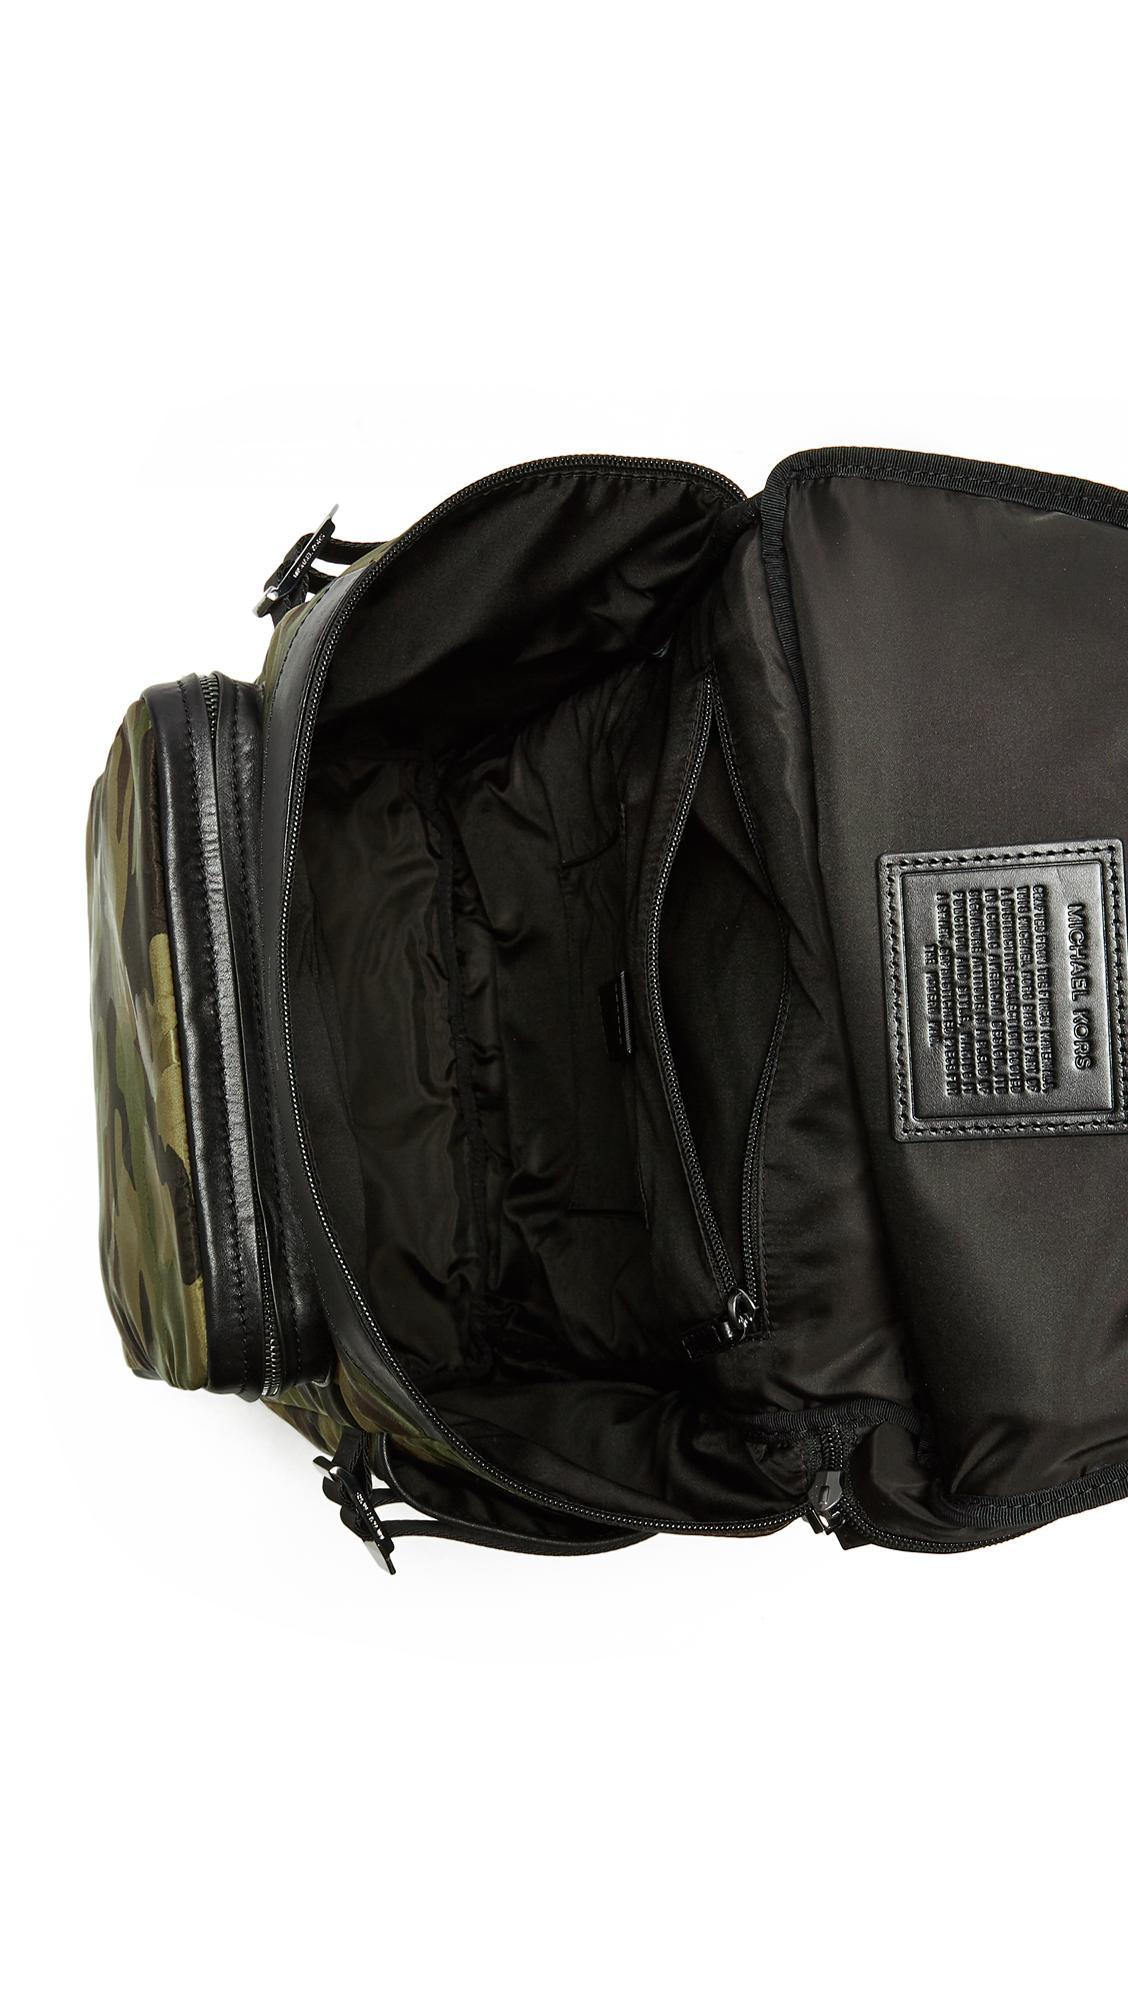 de30e2a5c52e Michael Kors Kent Camo Nylon Cycling Backpack in Black for Men - Lyst